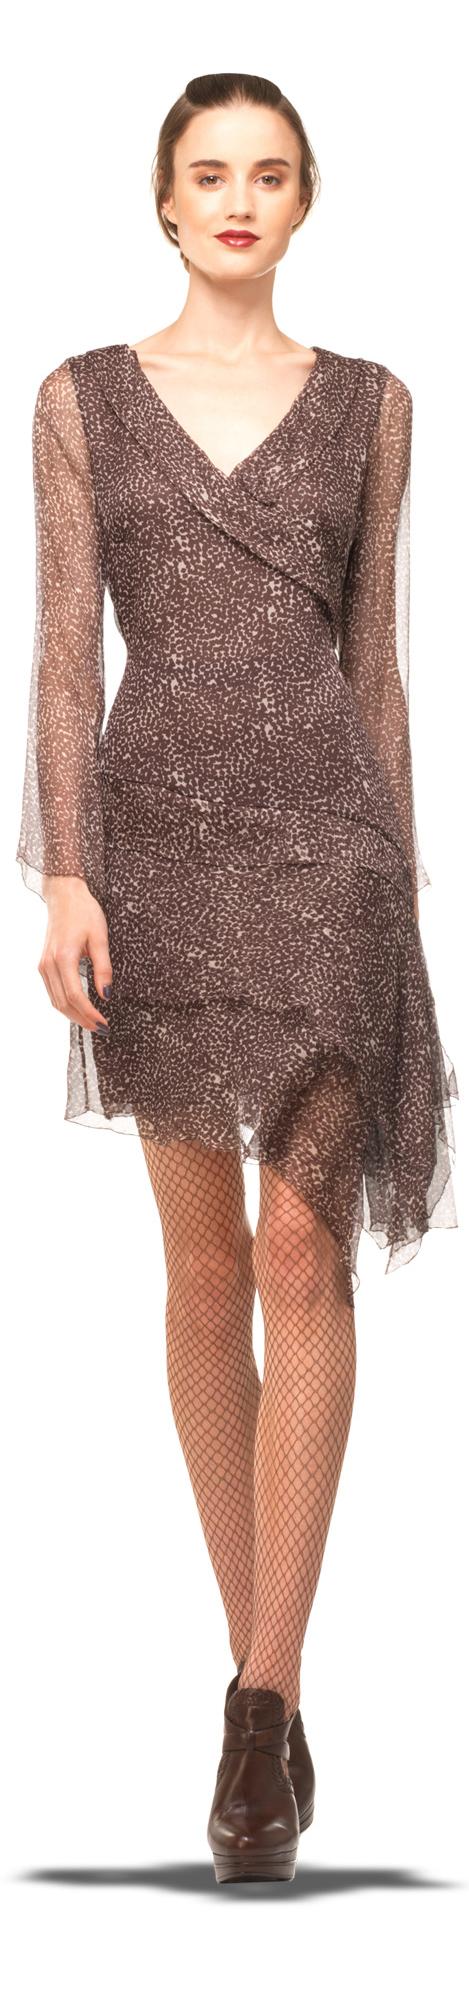 Womenus fashion sleeved dress red carpet fashion and brown